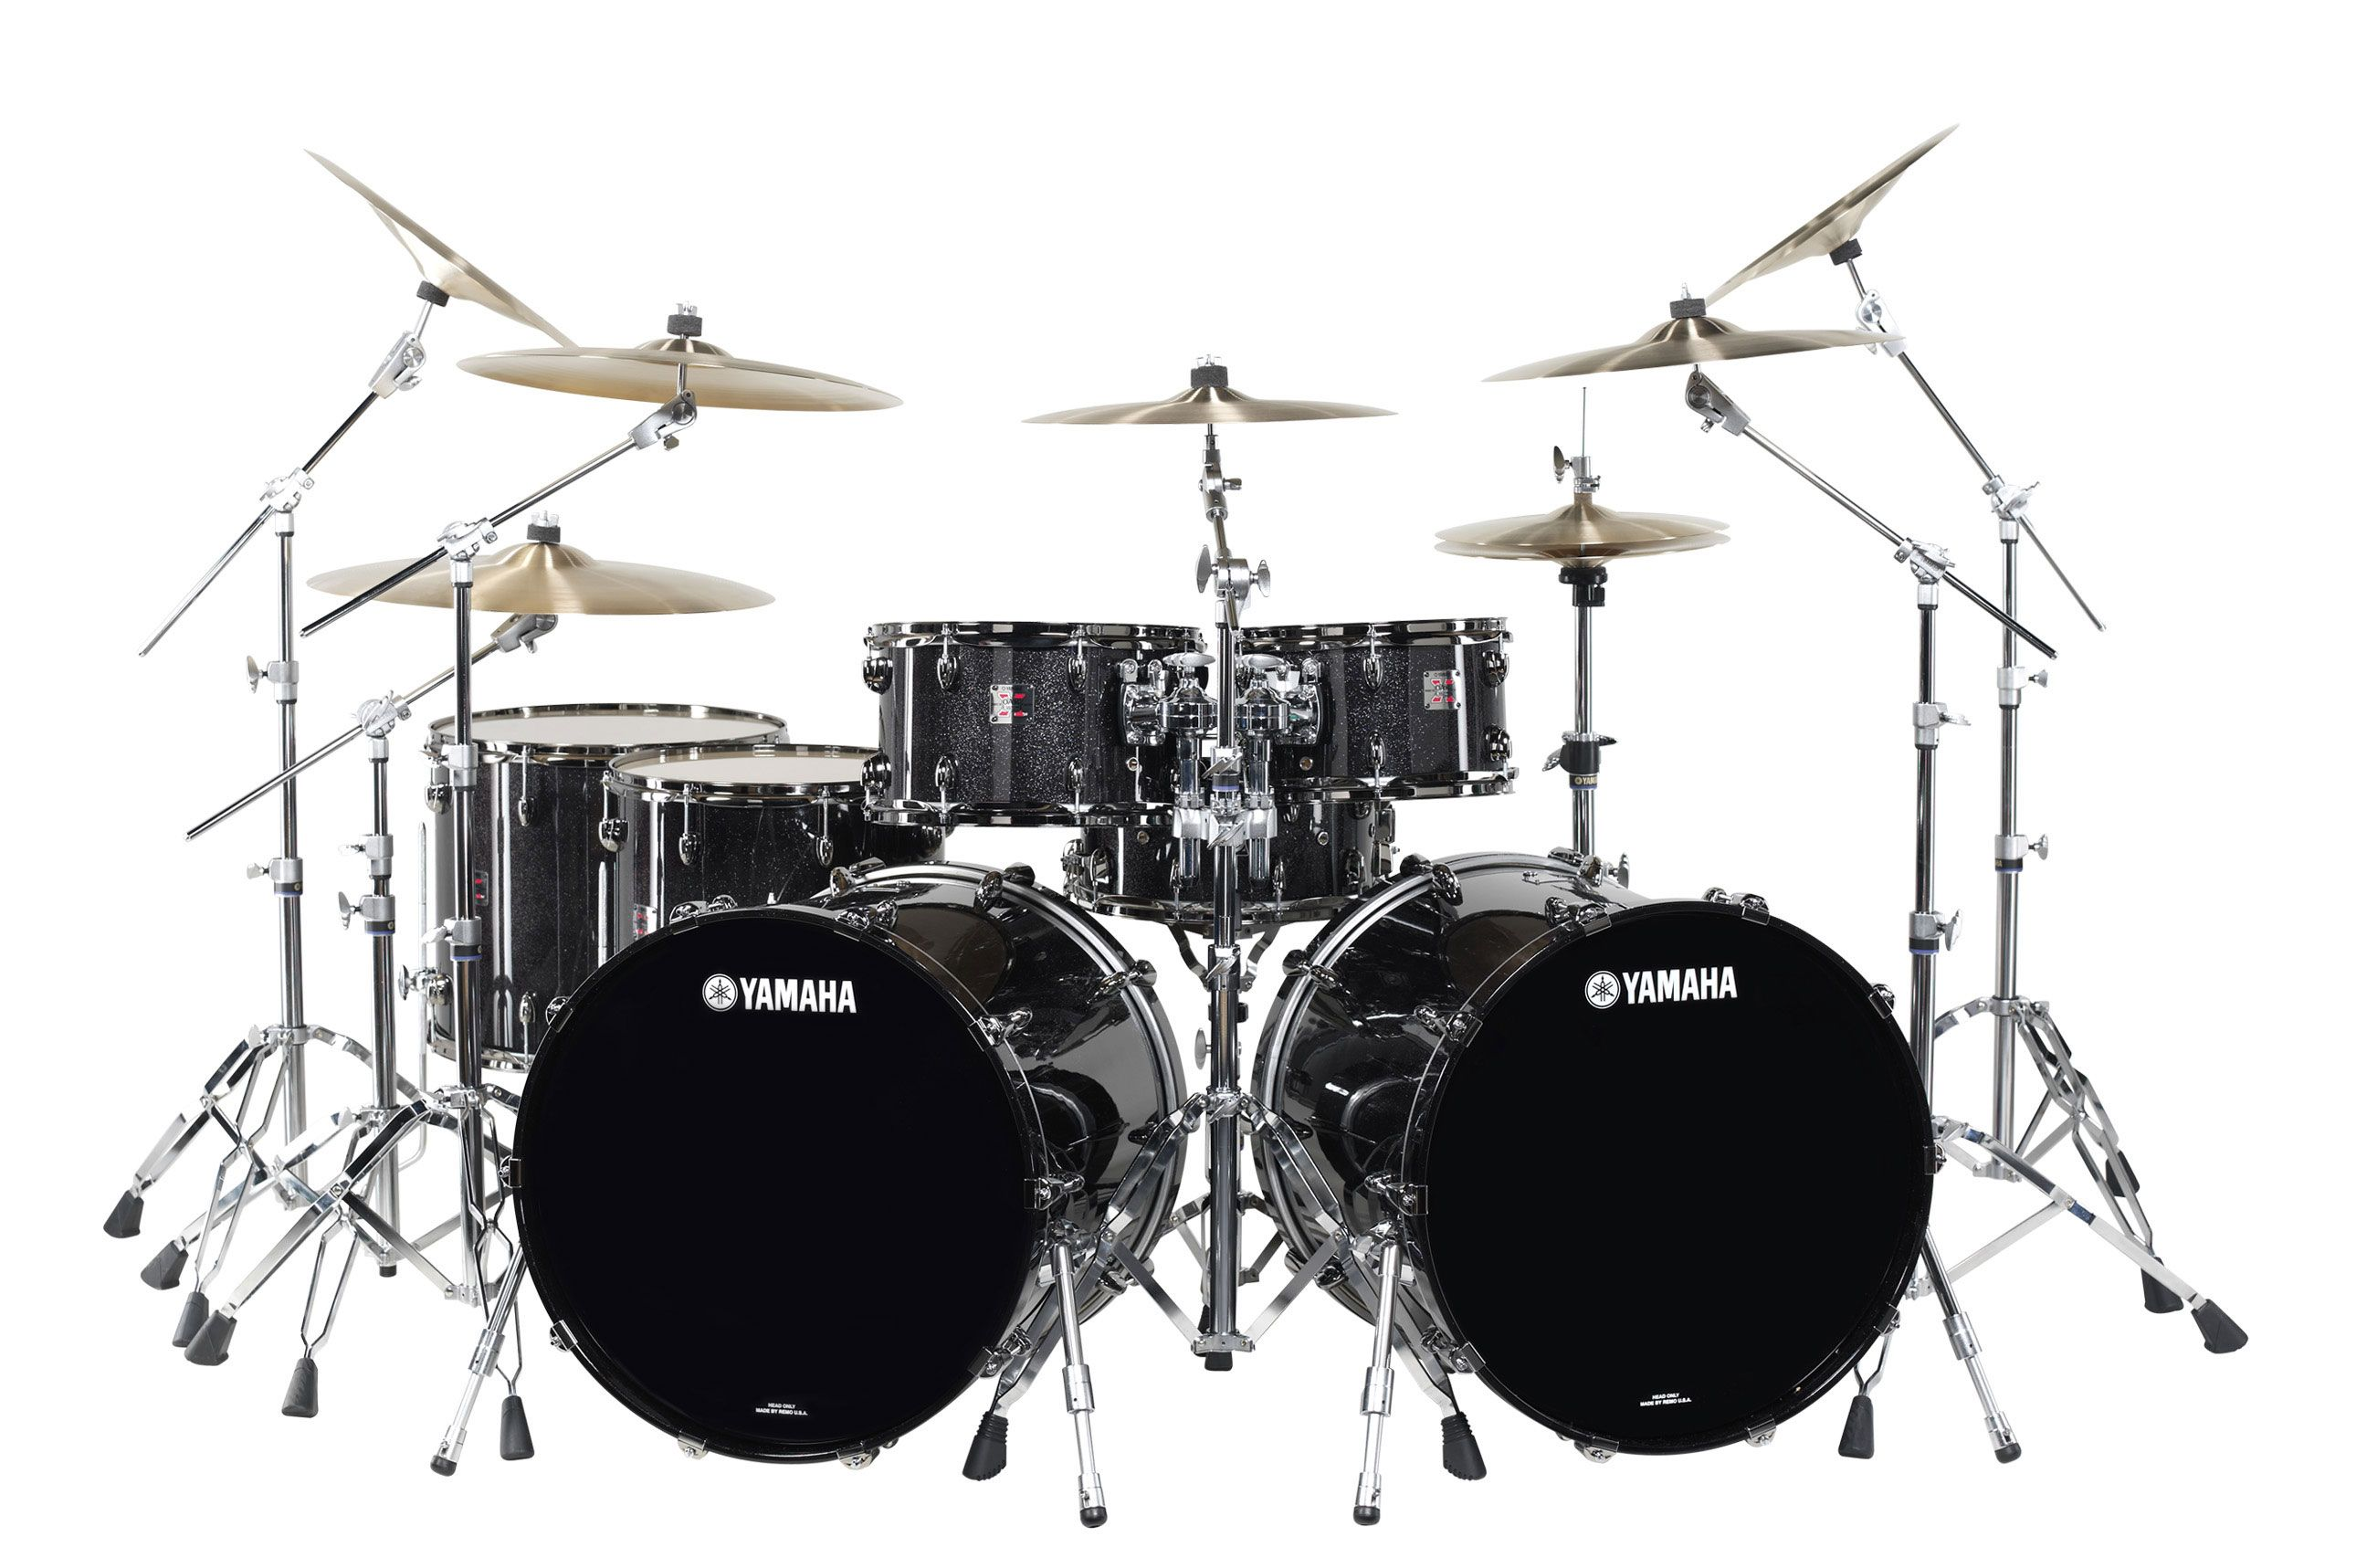 yamaha oak custom x acoustic drum kit yamaha acoustic and electronic drum kits acoustic drum. Black Bedroom Furniture Sets. Home Design Ideas